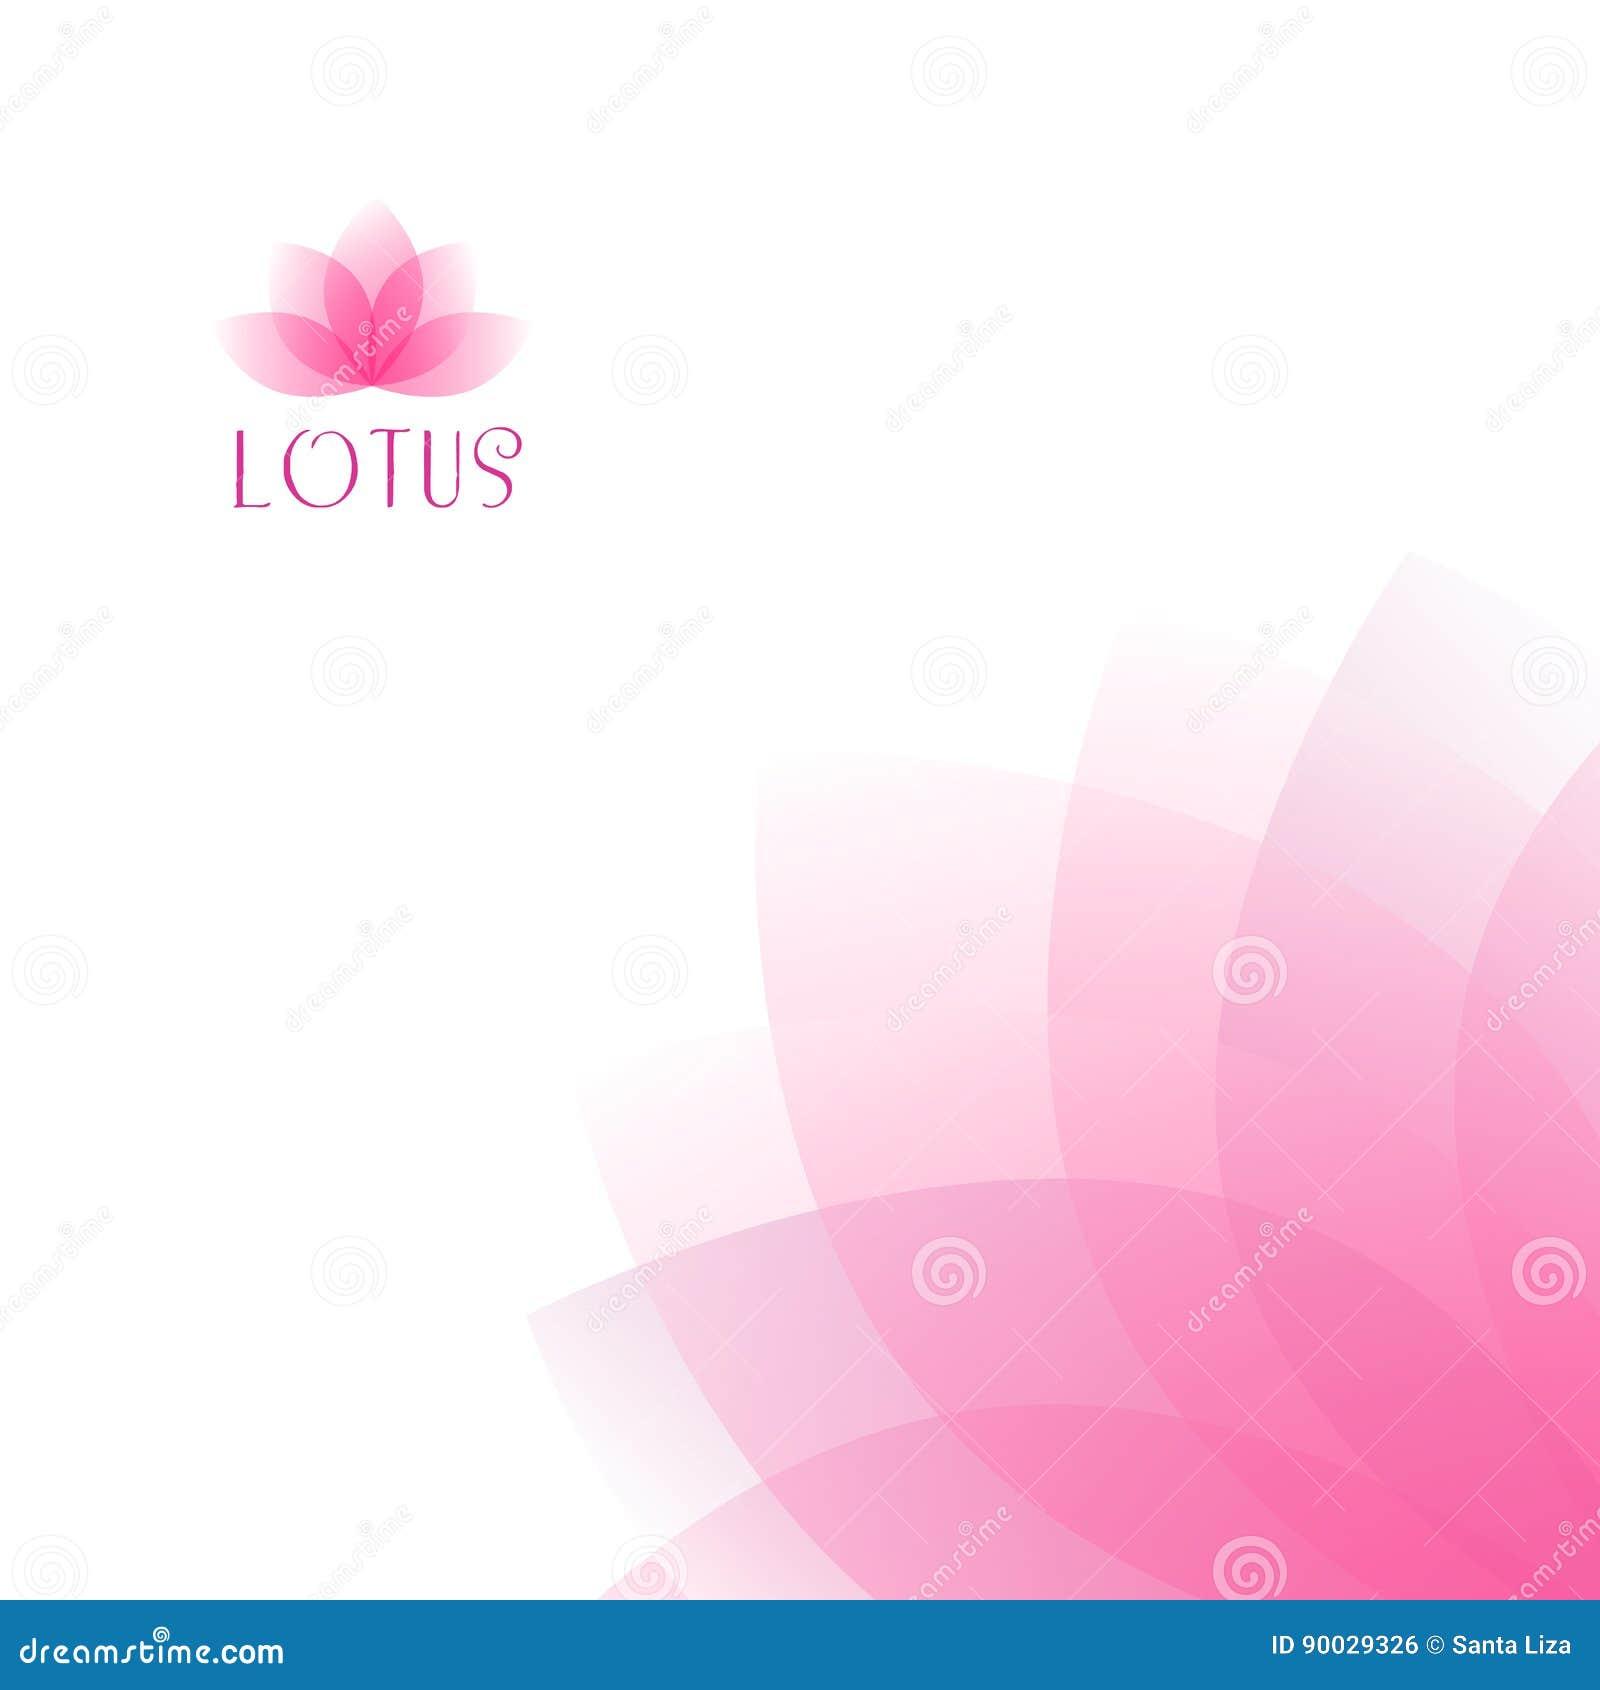 Light pink lotus flower background stock illustration light pink lotus flower background mightylinksfo